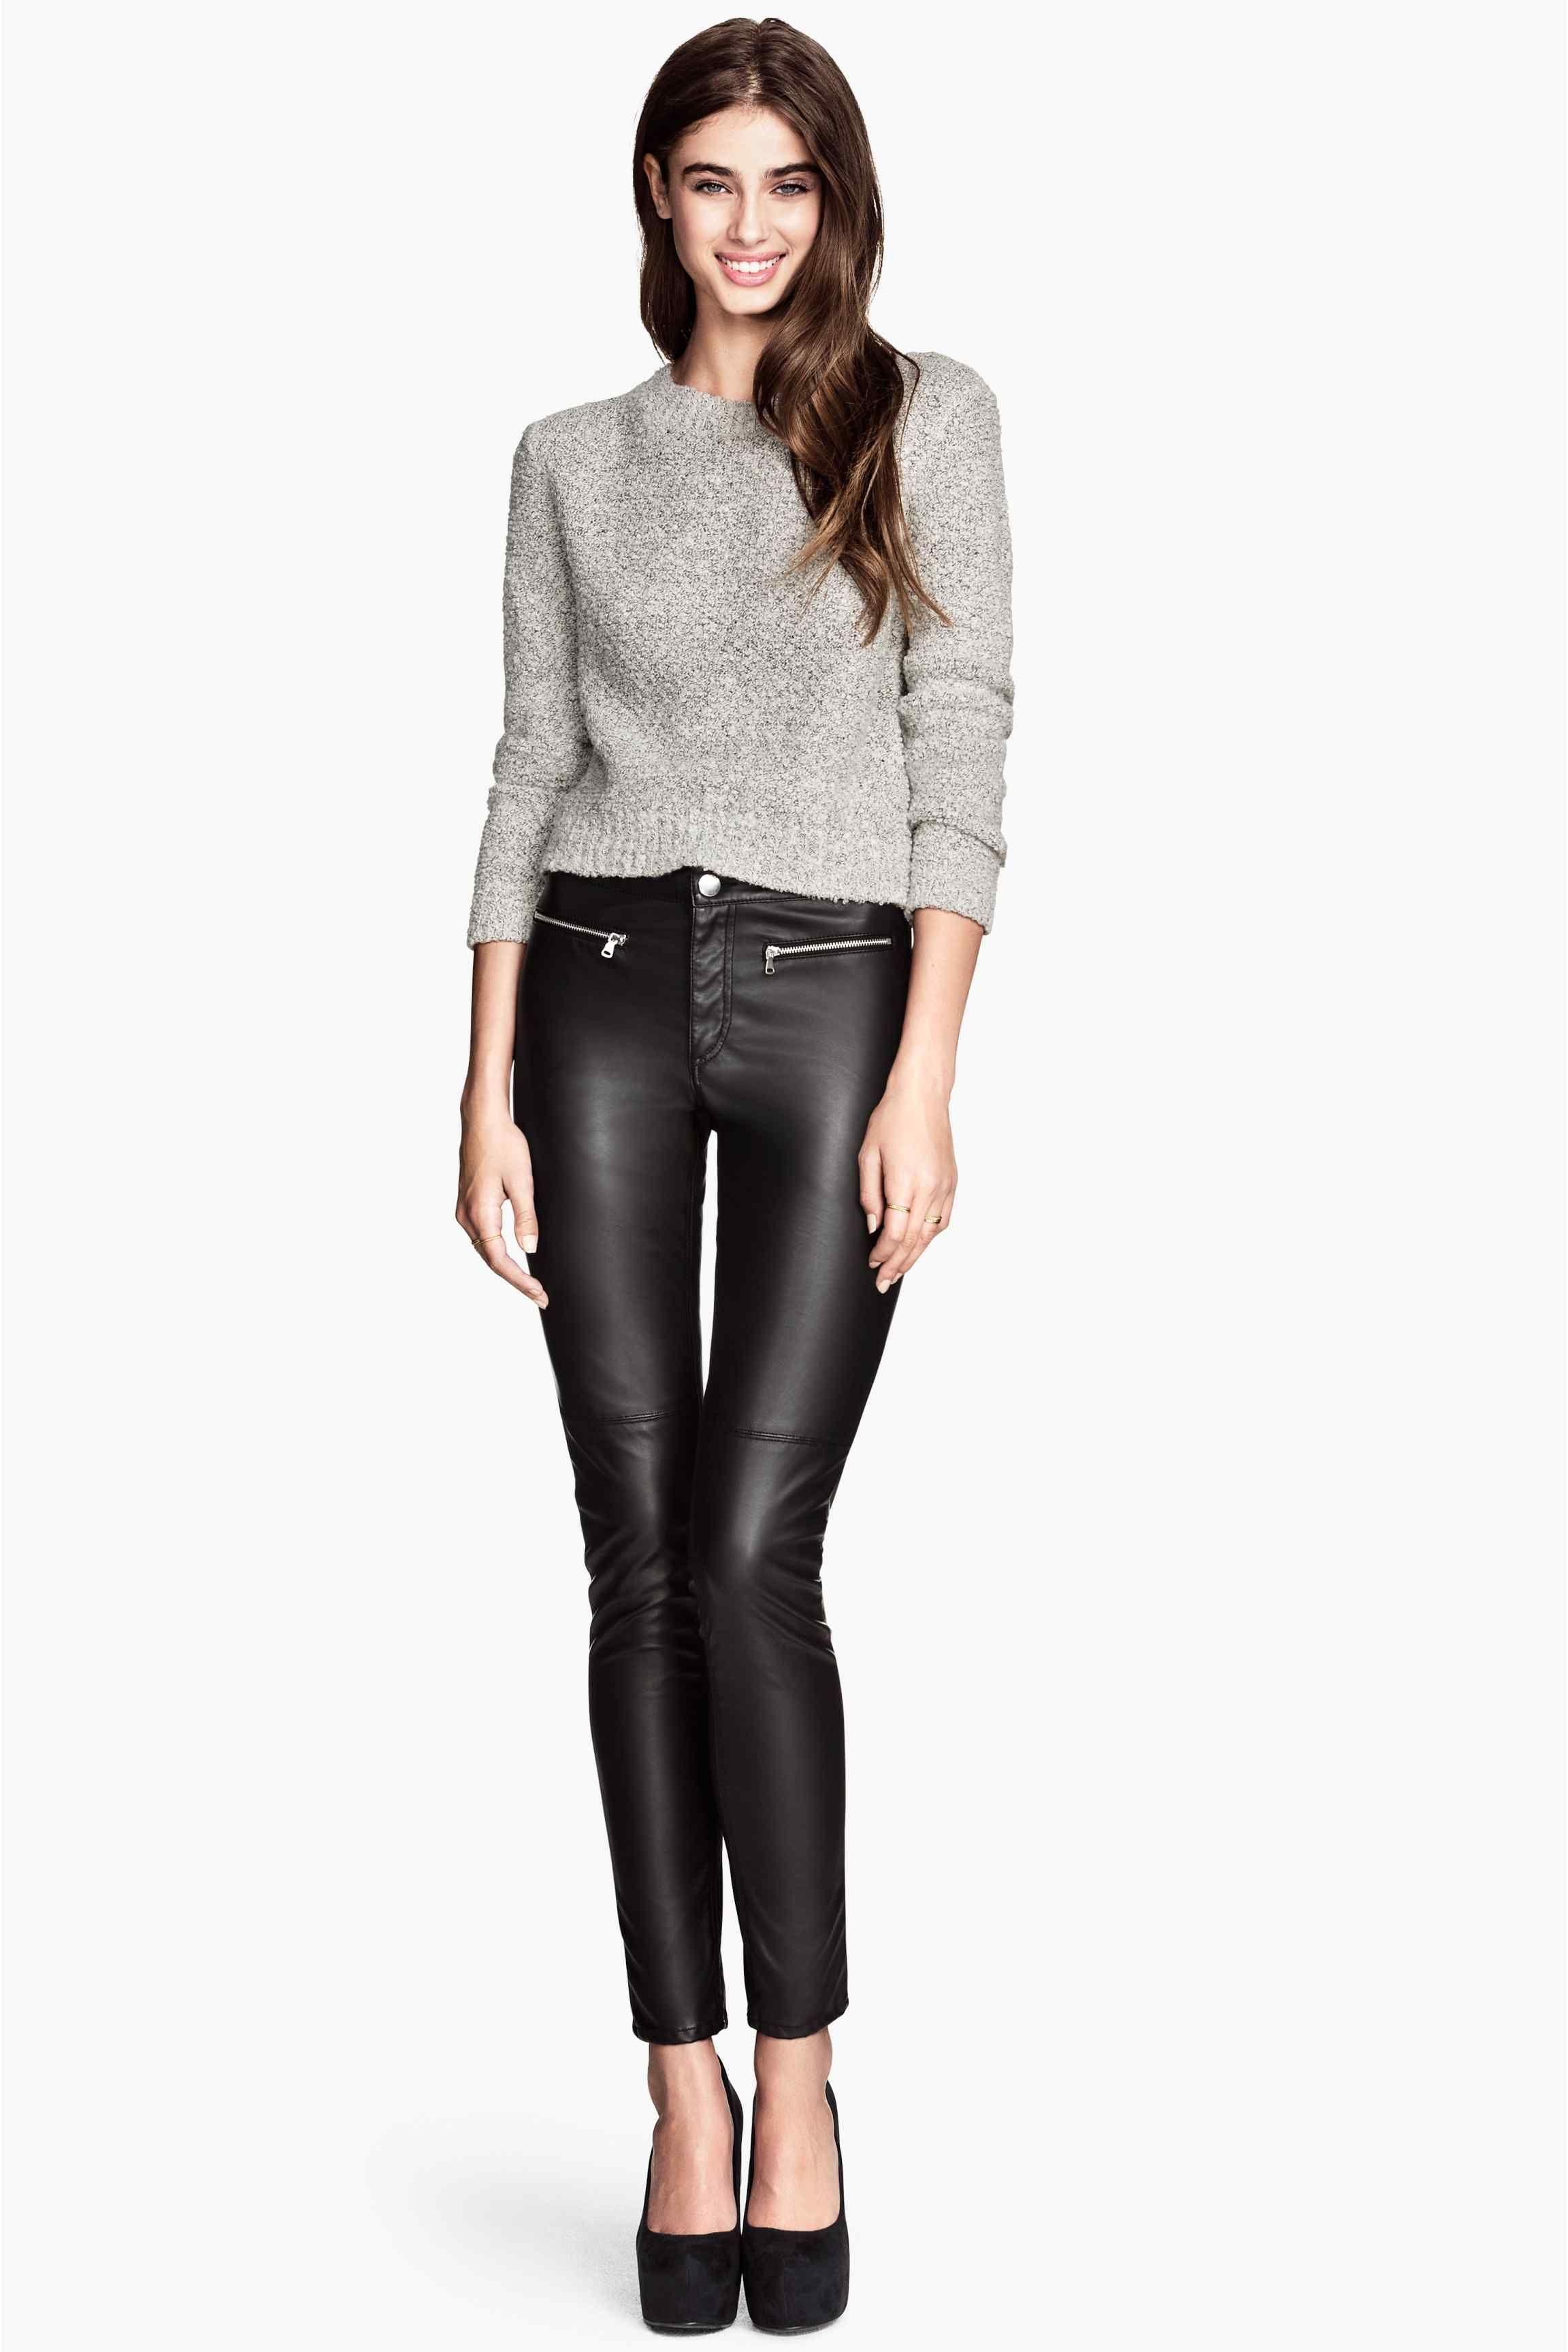 Pantalon de style motard - Noir/imitation cuir - FEMME | H&M FR